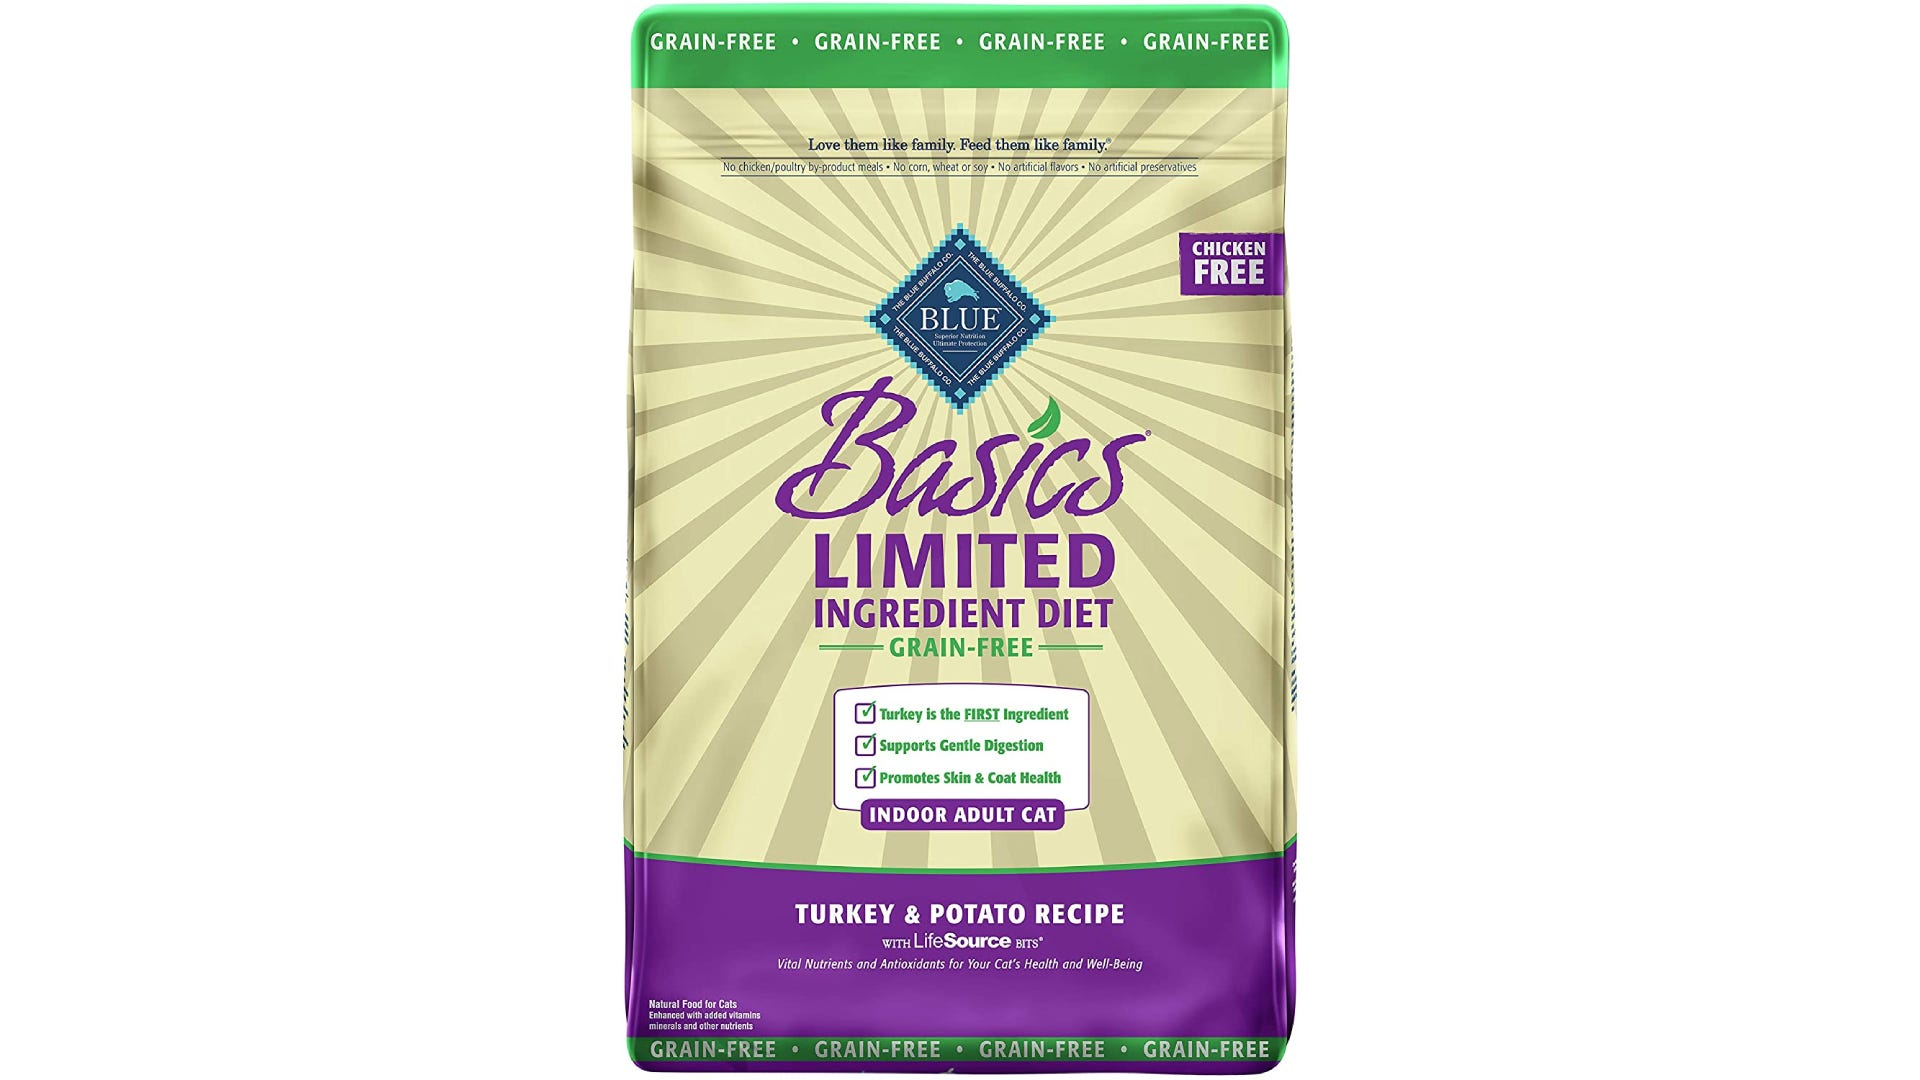 a bag of Blue Buffalo Basics dry cat food